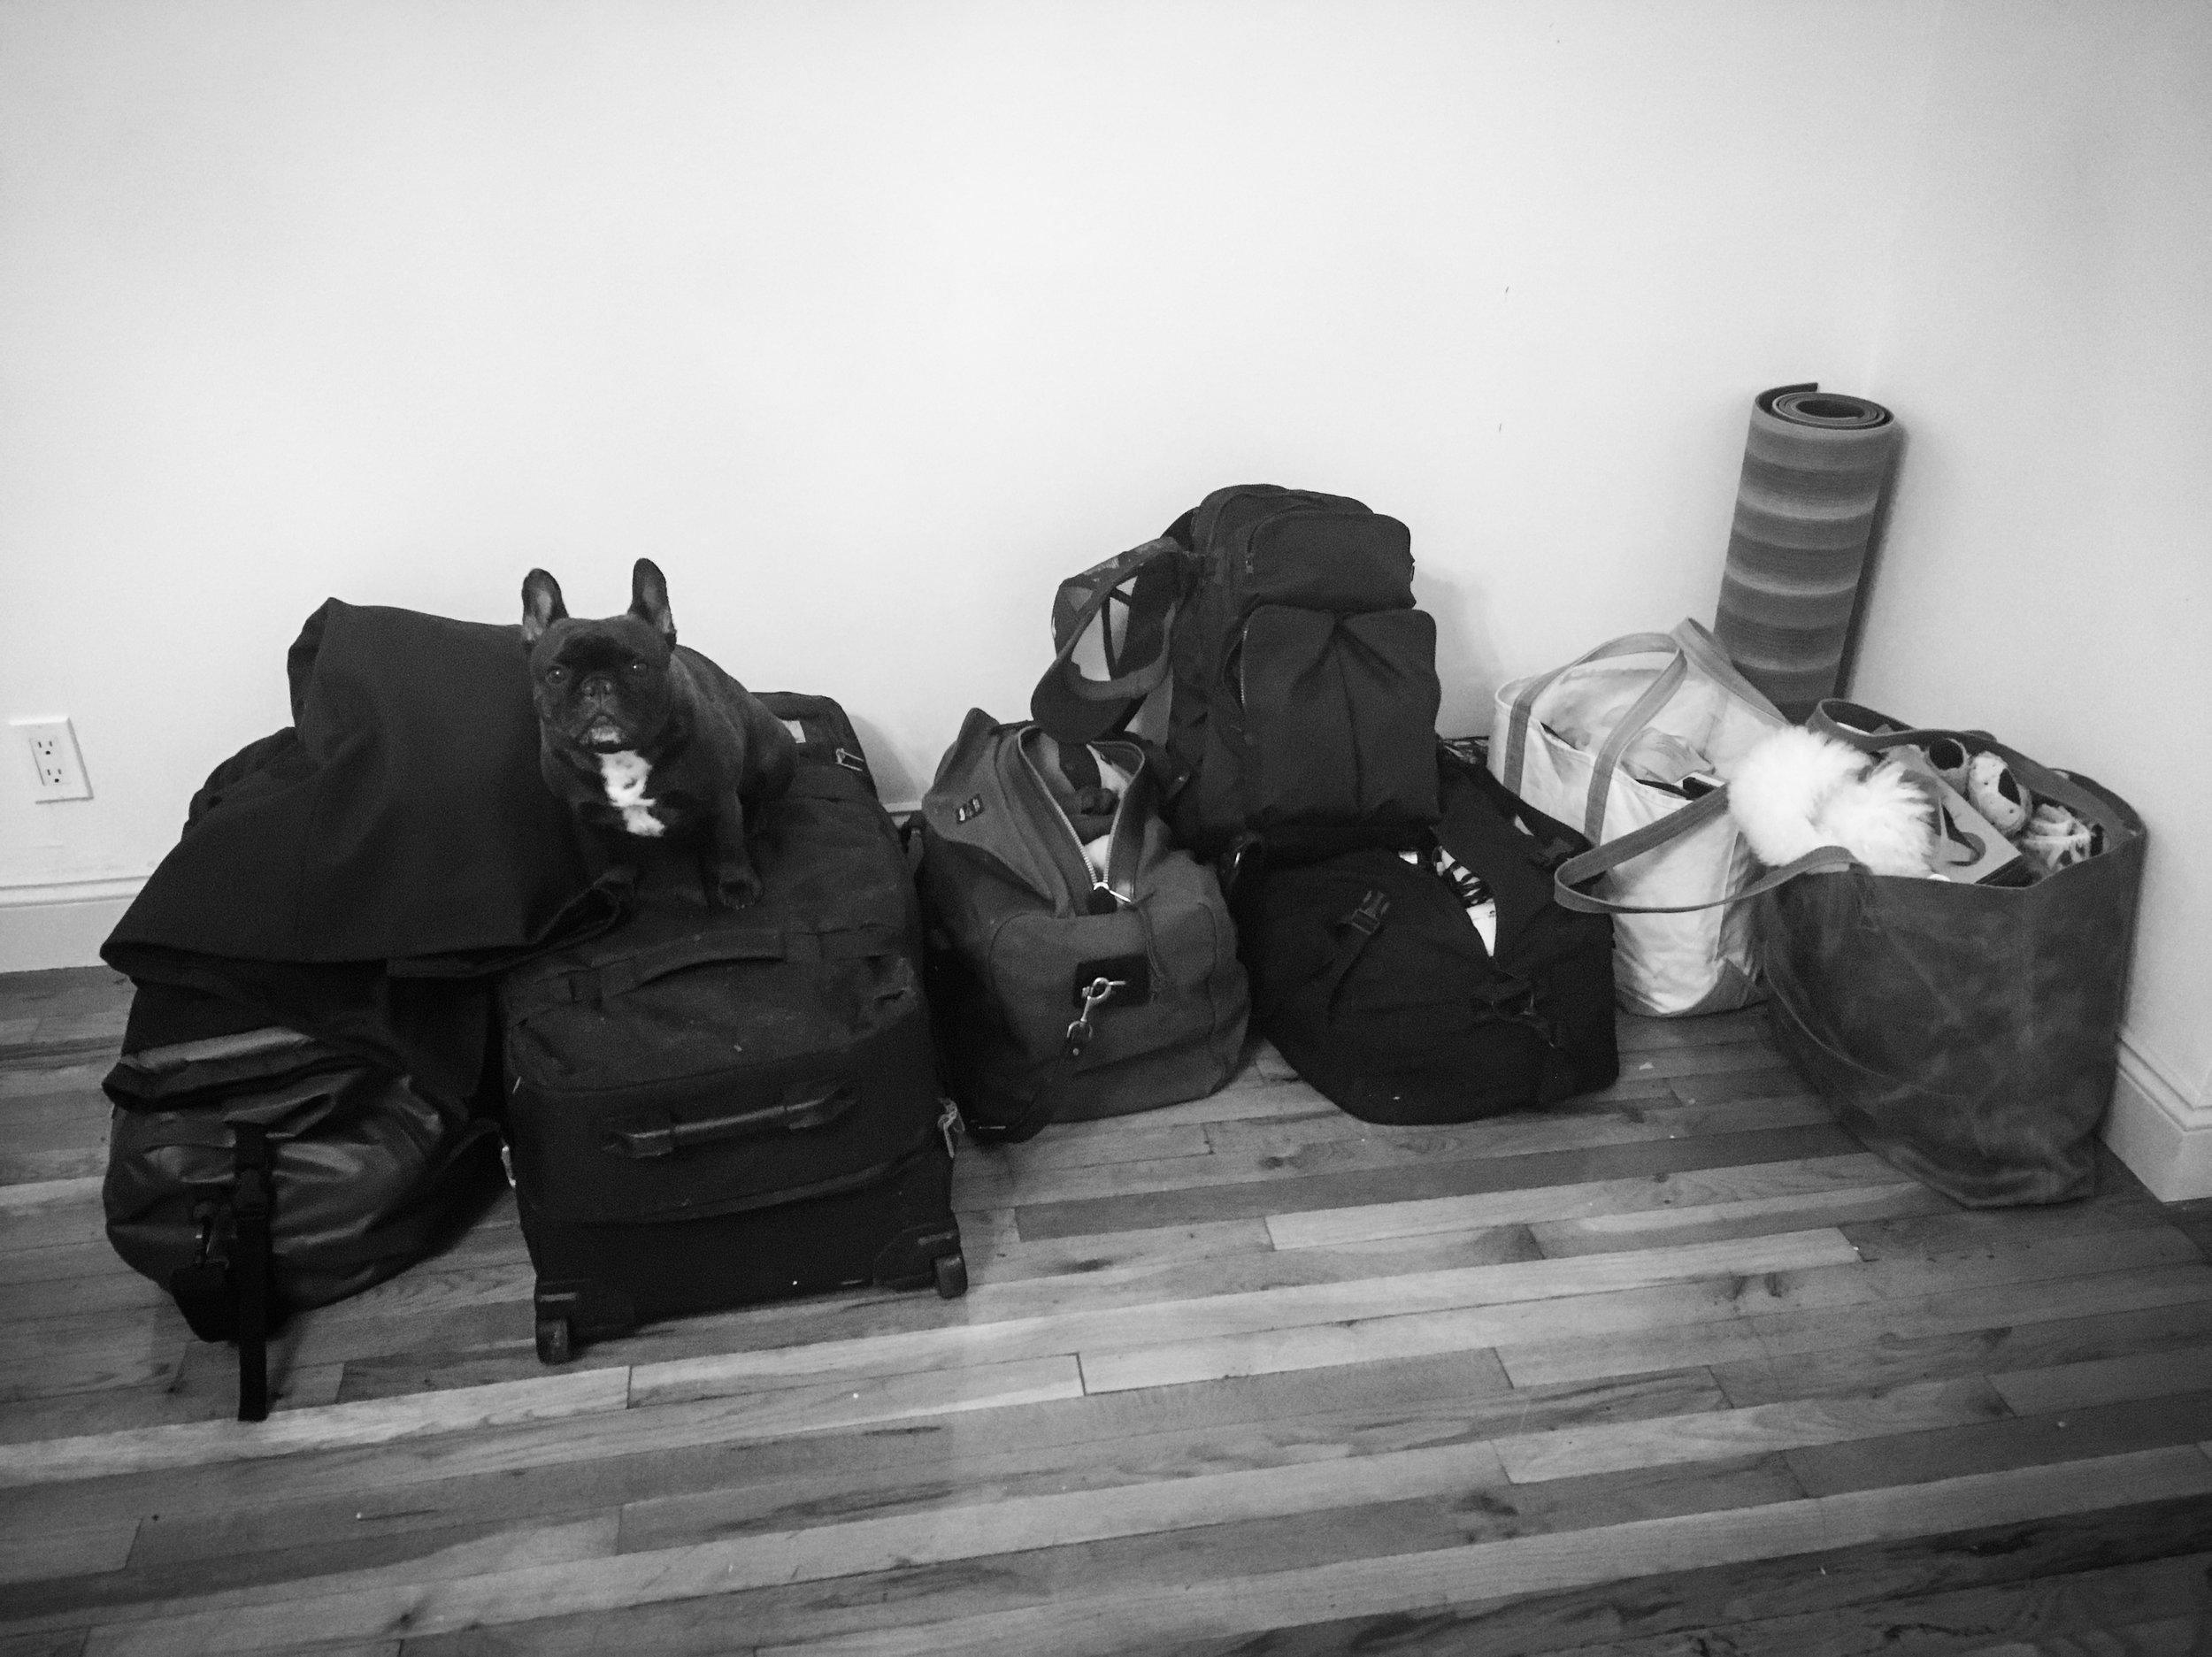 Bear on Bags 10.31.18